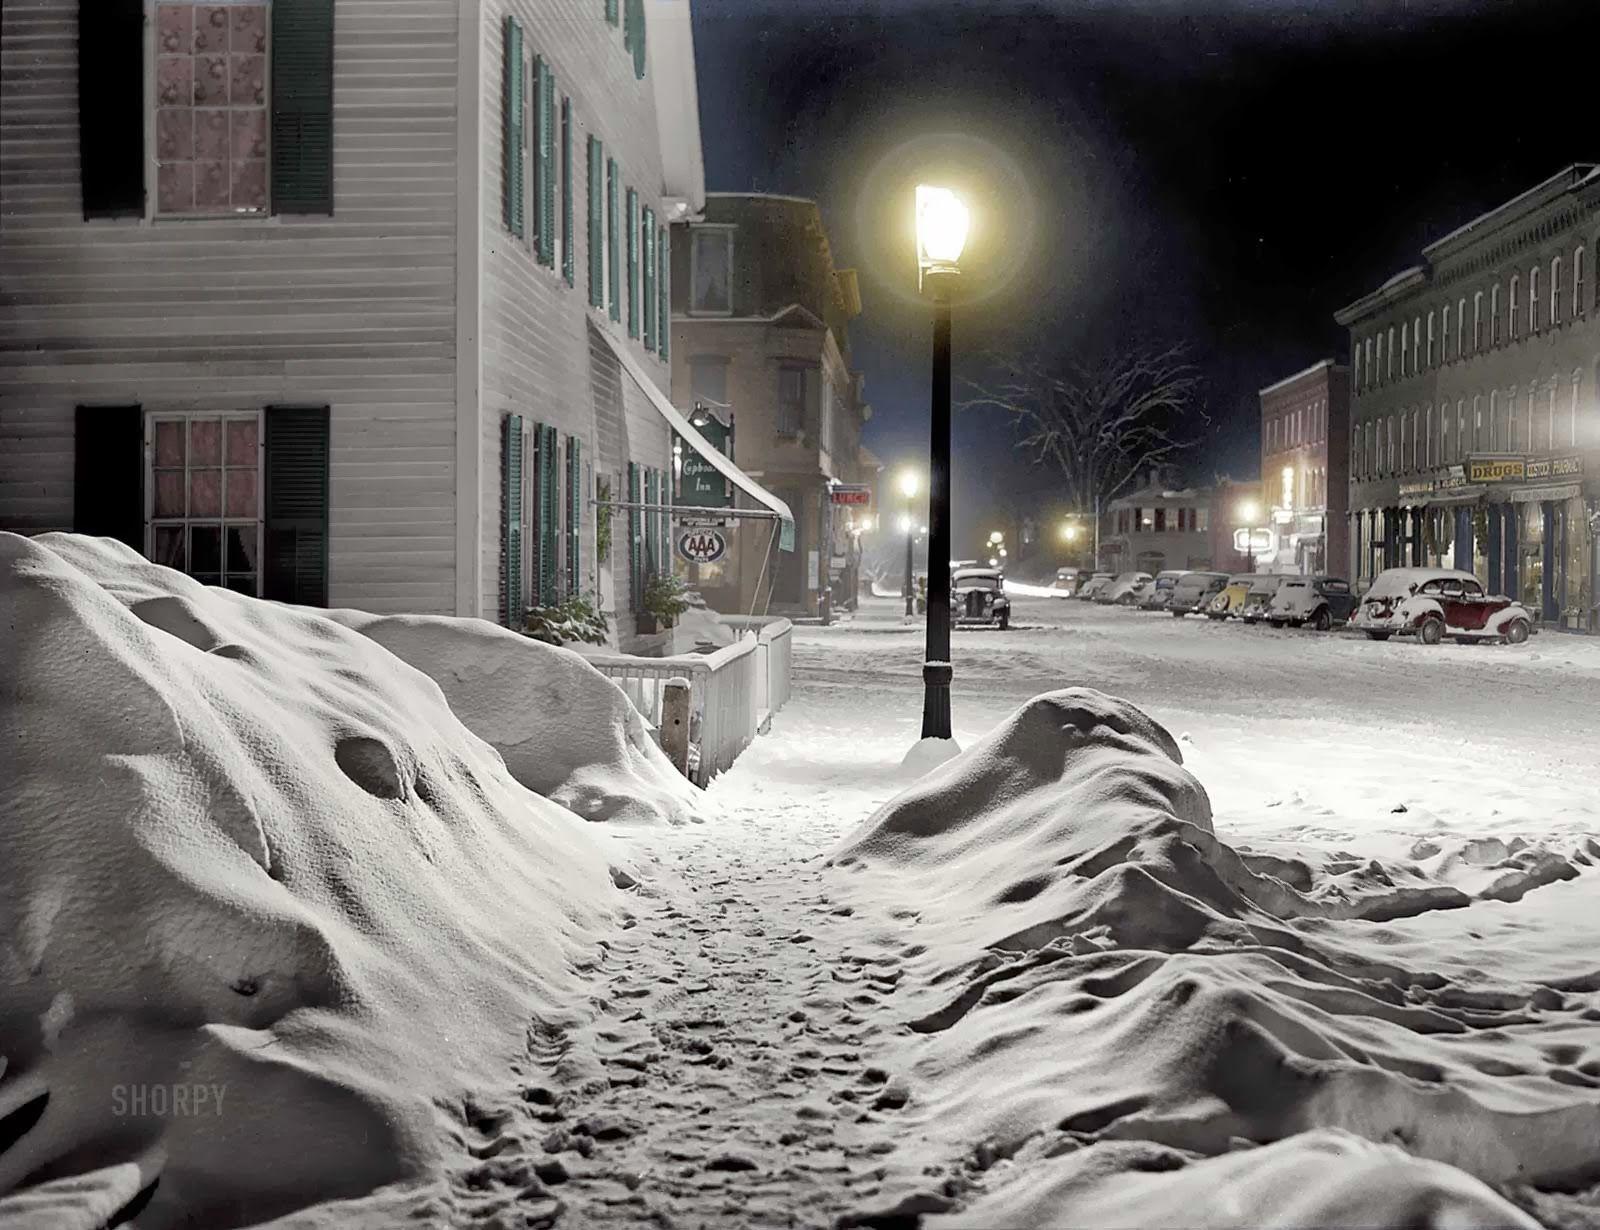 Vermont Snow Scenes at Night | 1940 shorpy snow removal 1908 nyc snow man happy